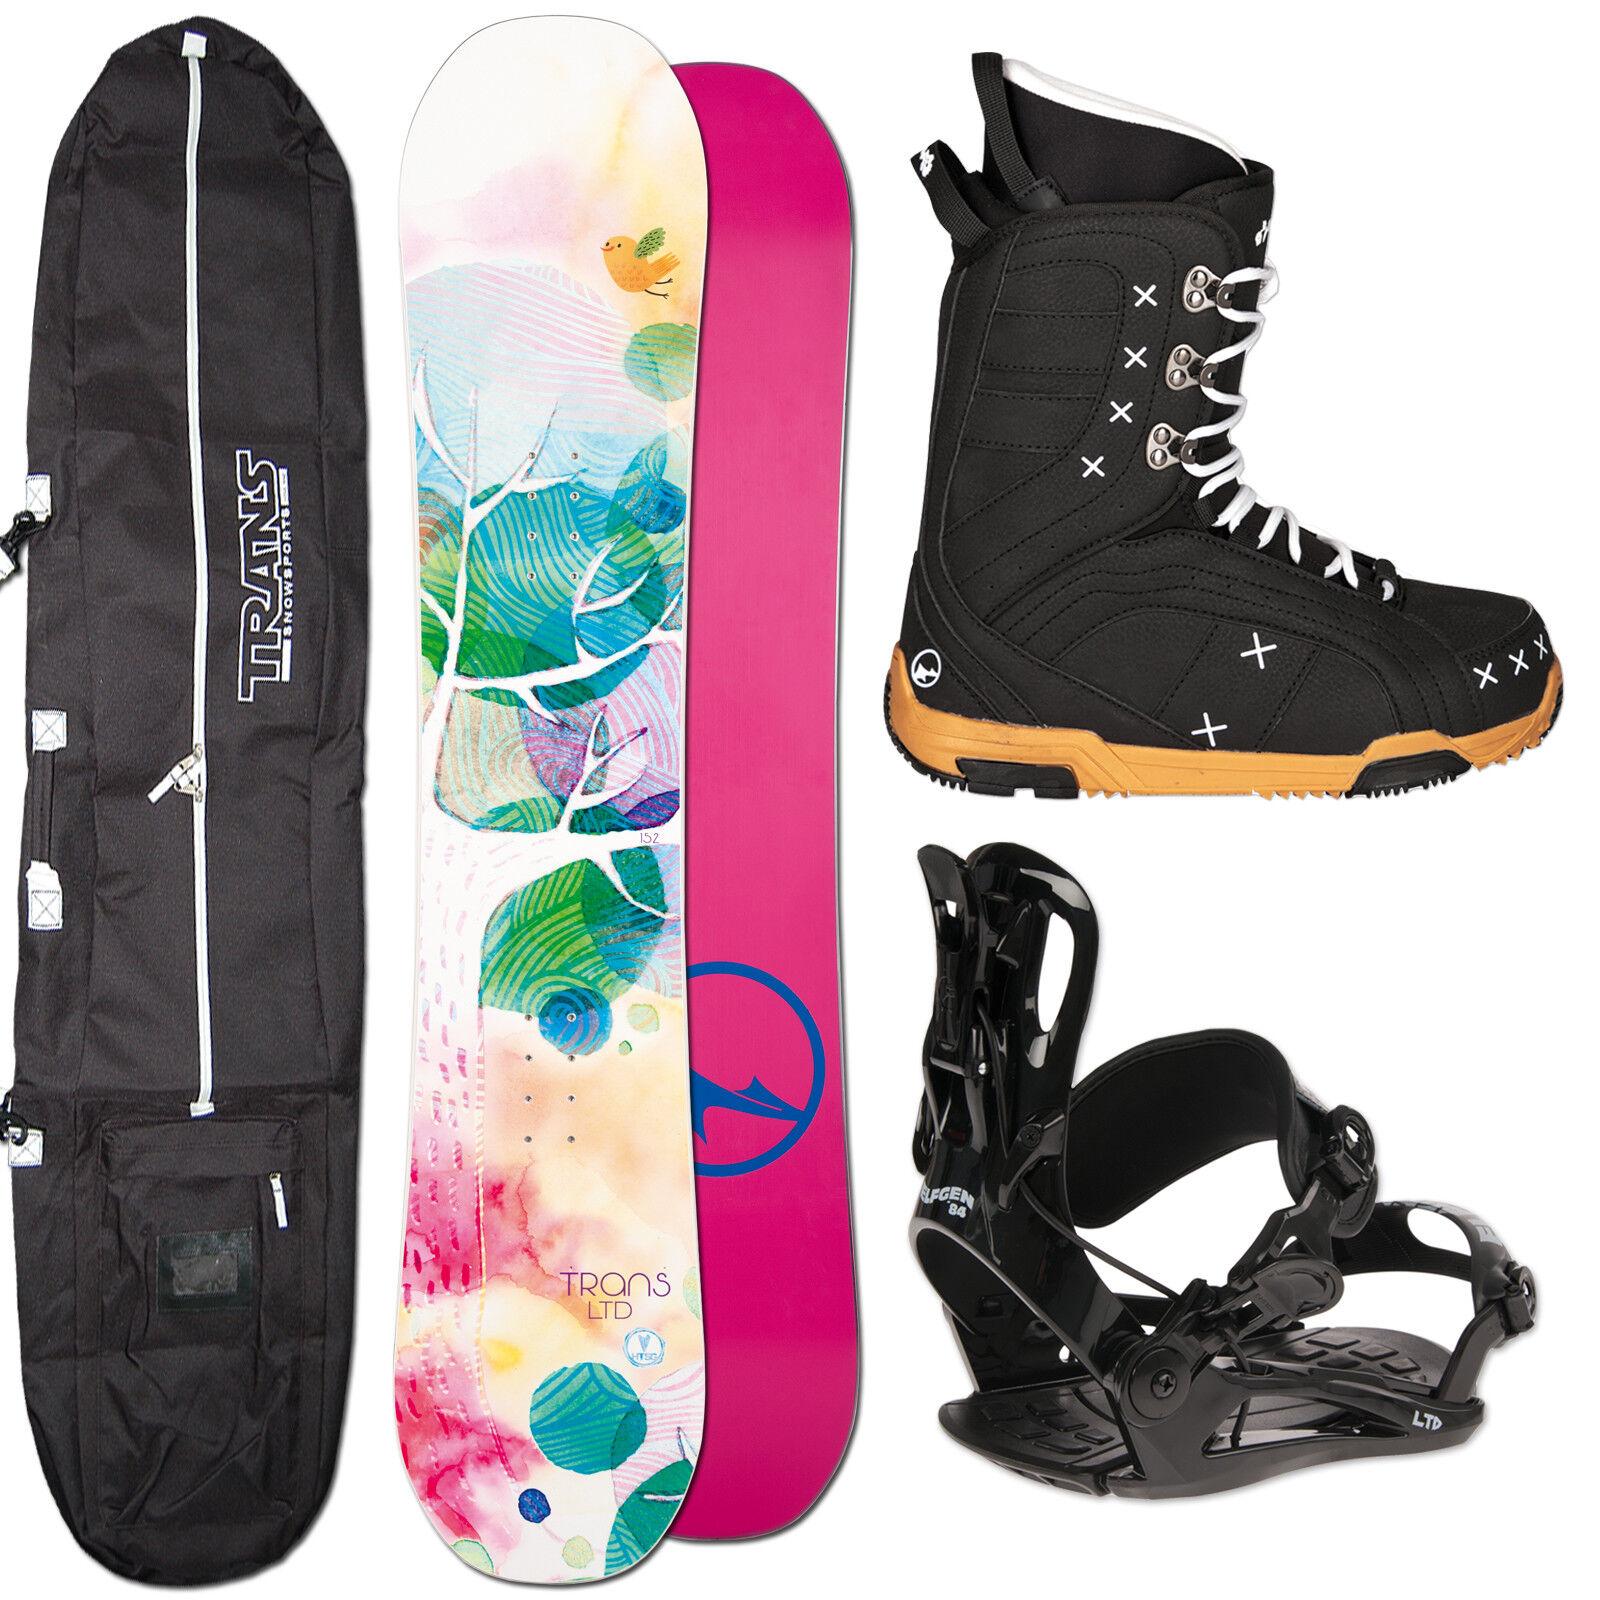 Women's Snowboard Set Trans Ltd 152 cm + Fastec Binding SIZE M + Boots+ Bag